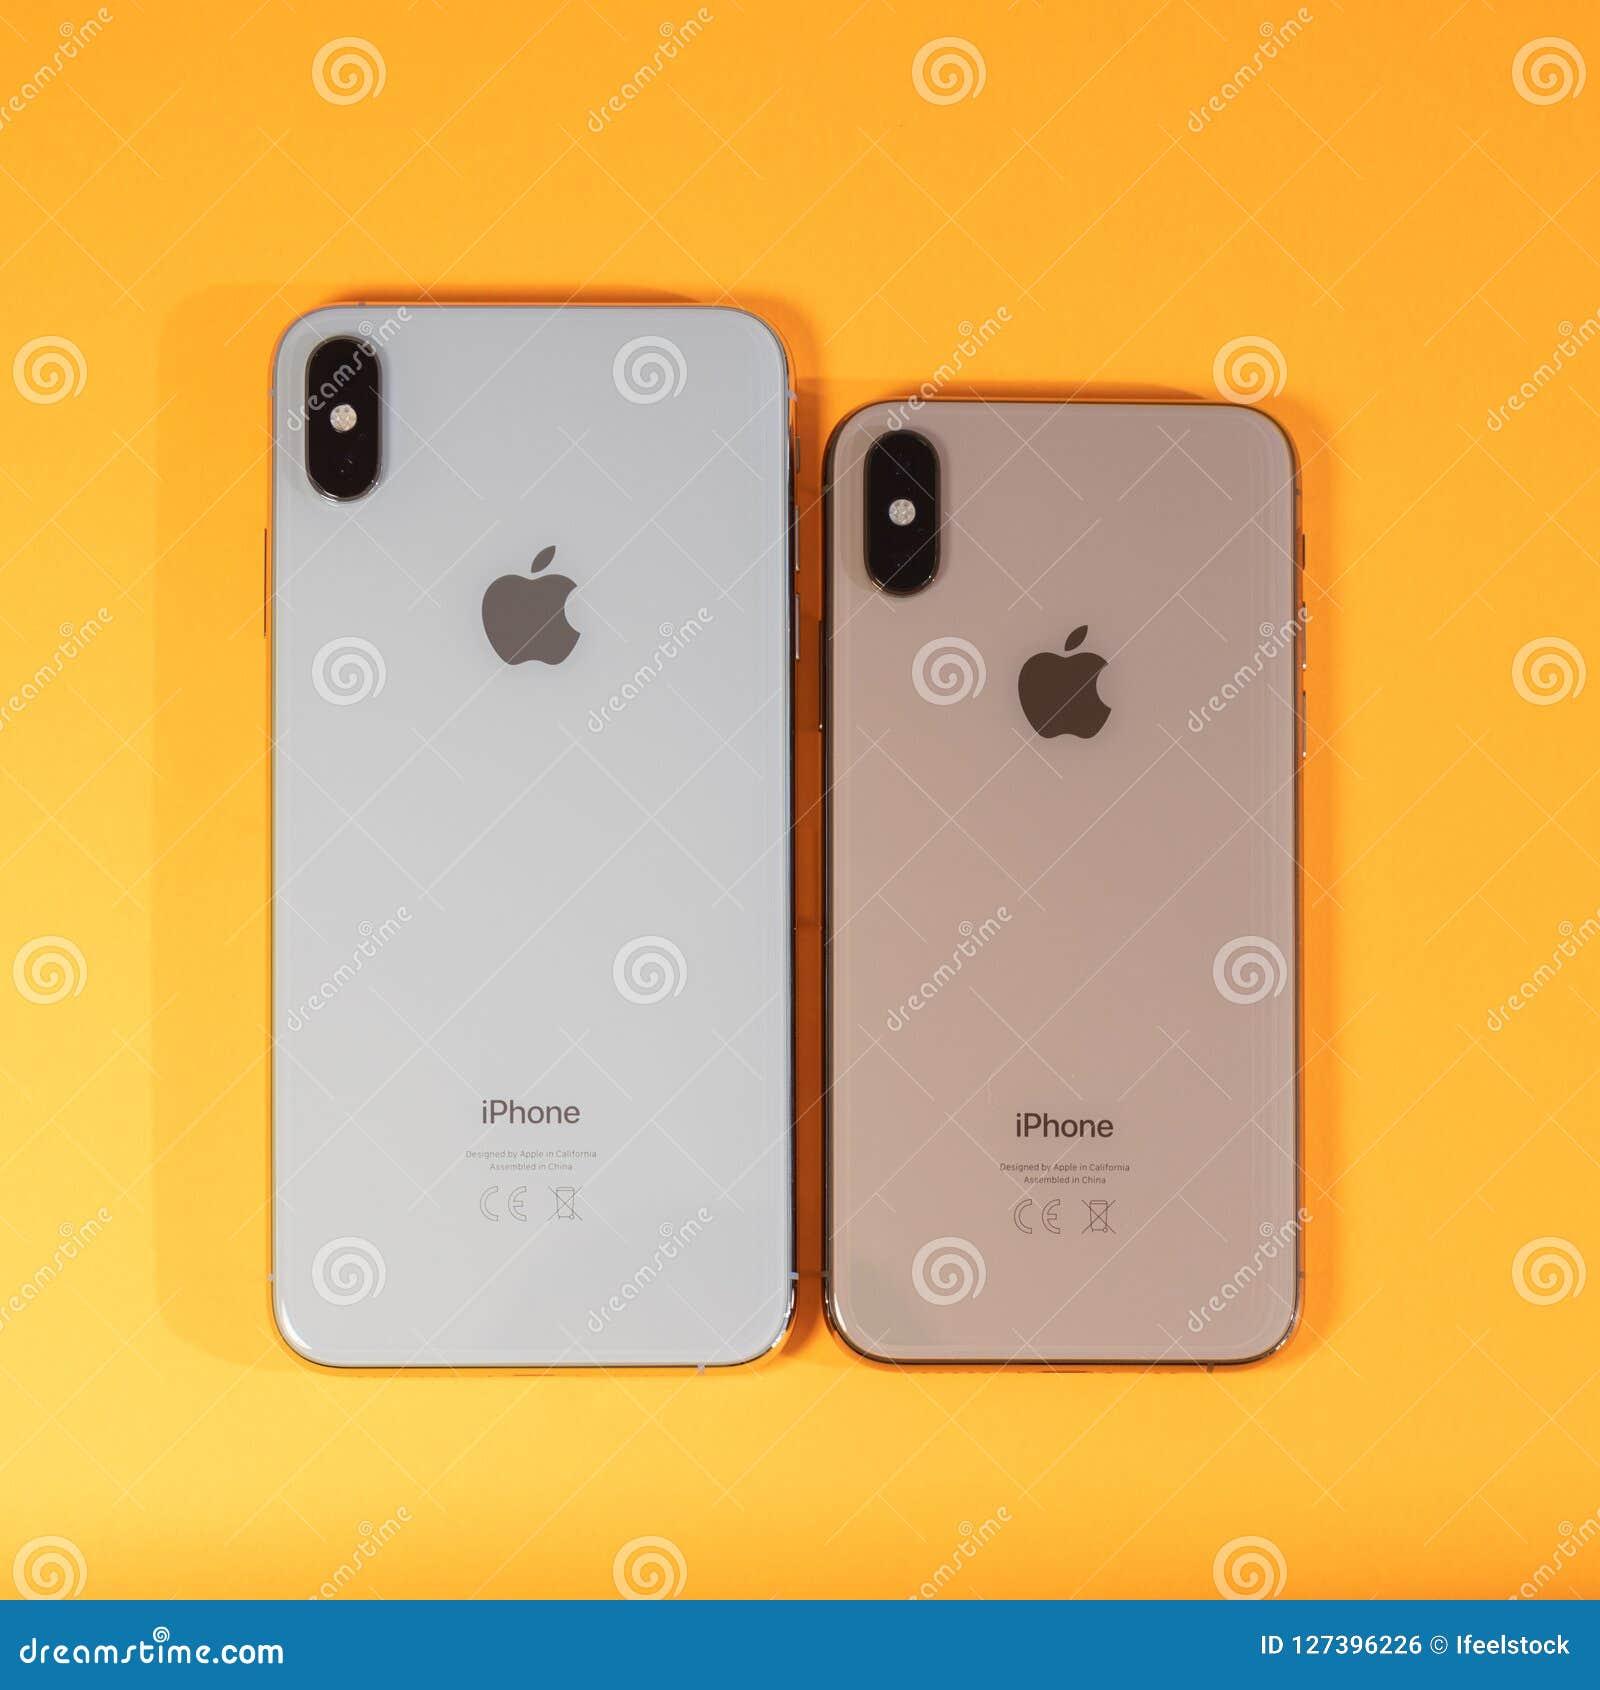 Apple Iphone Xs Max Against Vibrant Orange Background